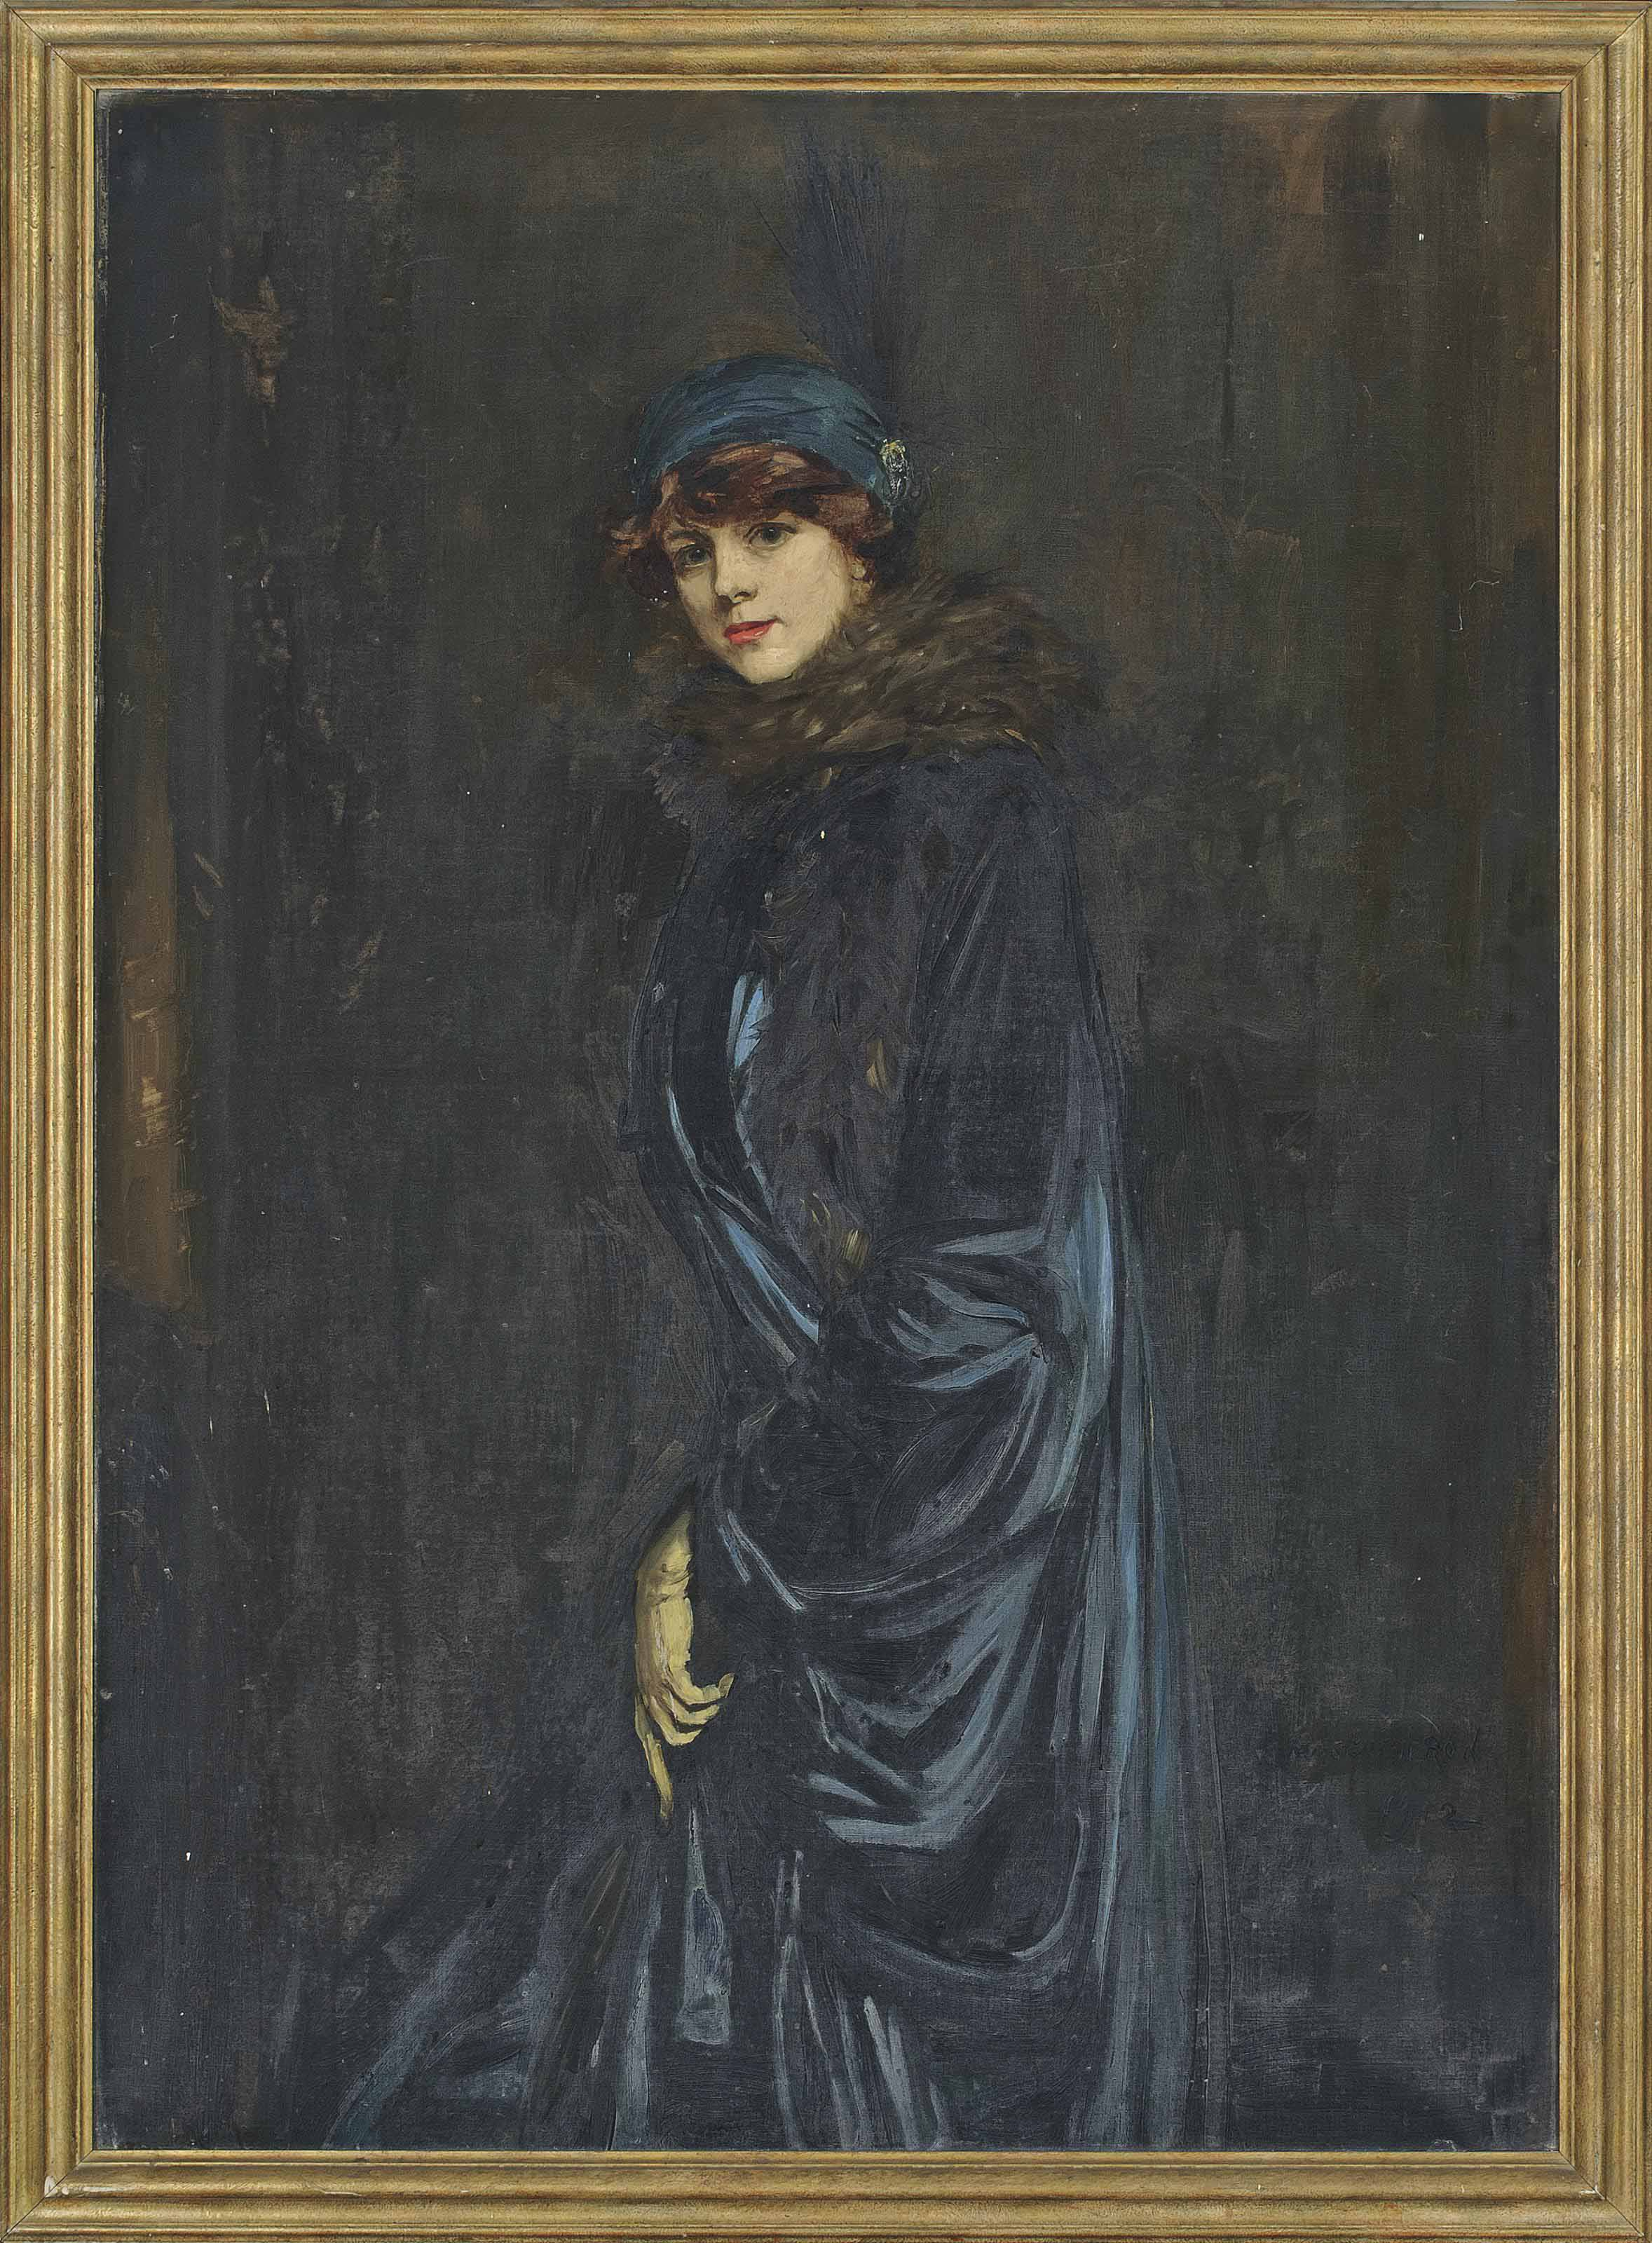 Robert Lea MacCameron (American, 1866-1912)